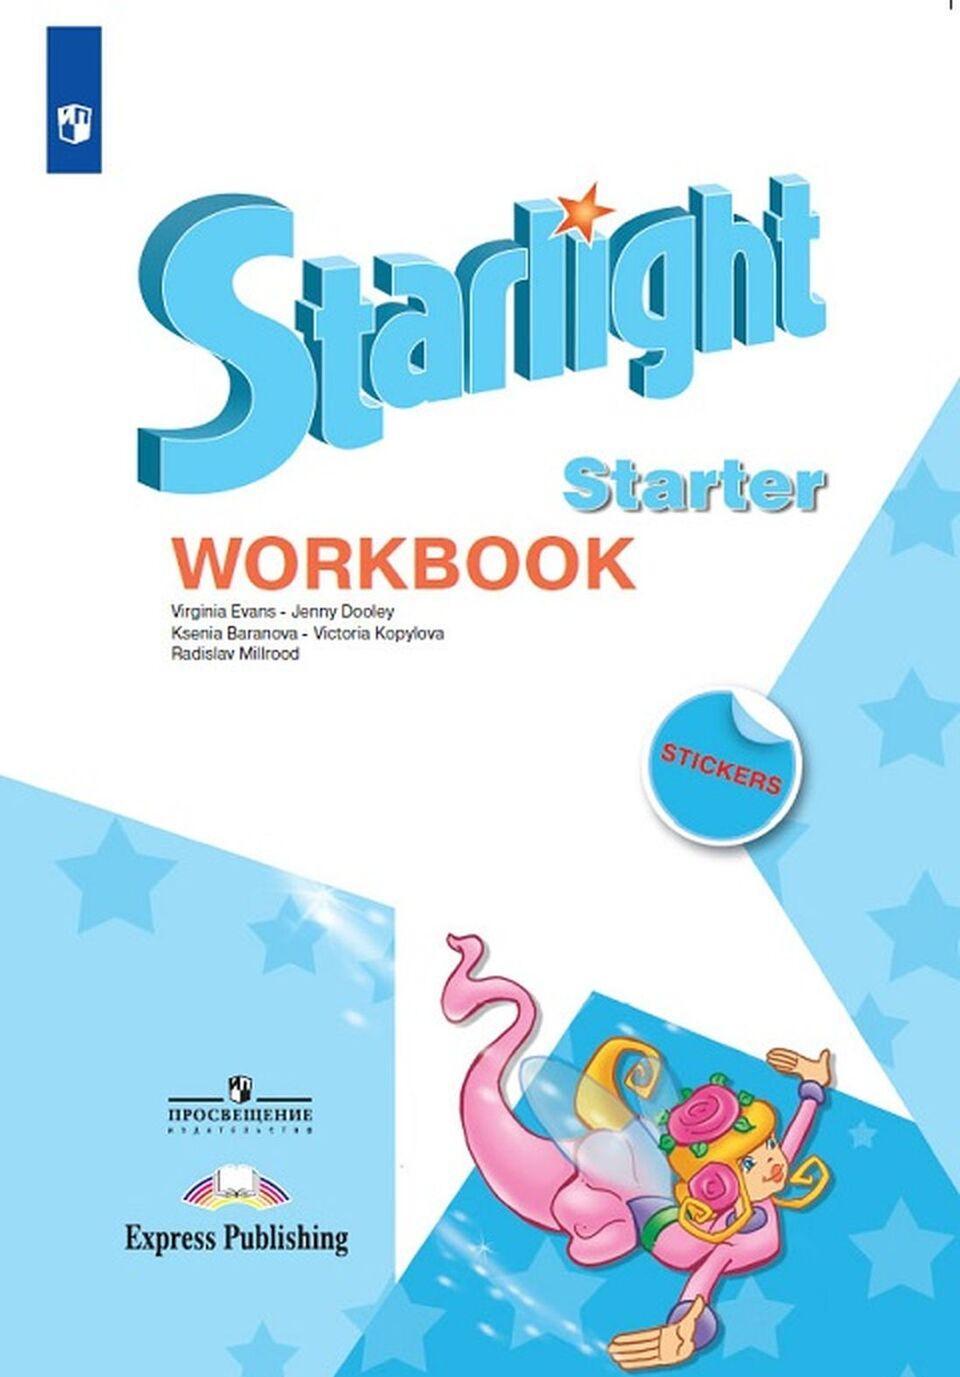 Starlight. Workbook / Anglijskij jazyk. Rabochaja tetrad k uchebnomu posobiju dlja nachinajuschikh. * | Kopylova Viktorija Viktorovna, Duli Dzhenni